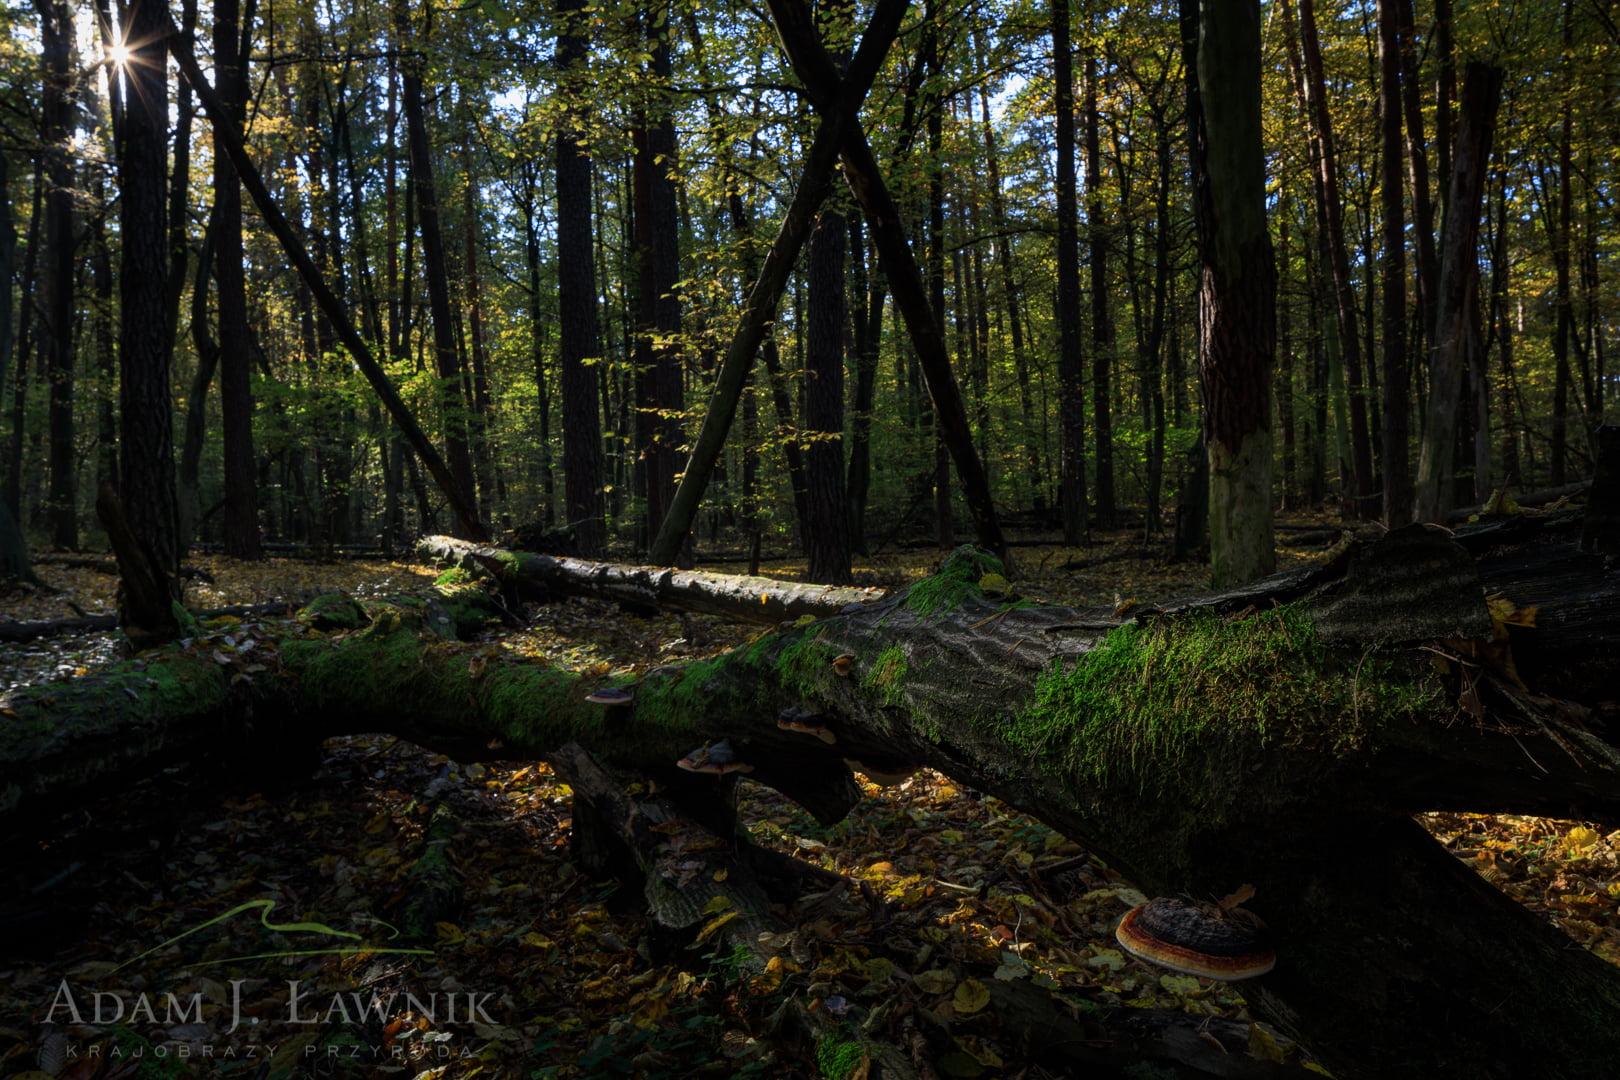 Kampinos National Park, Poland 1710-01109C